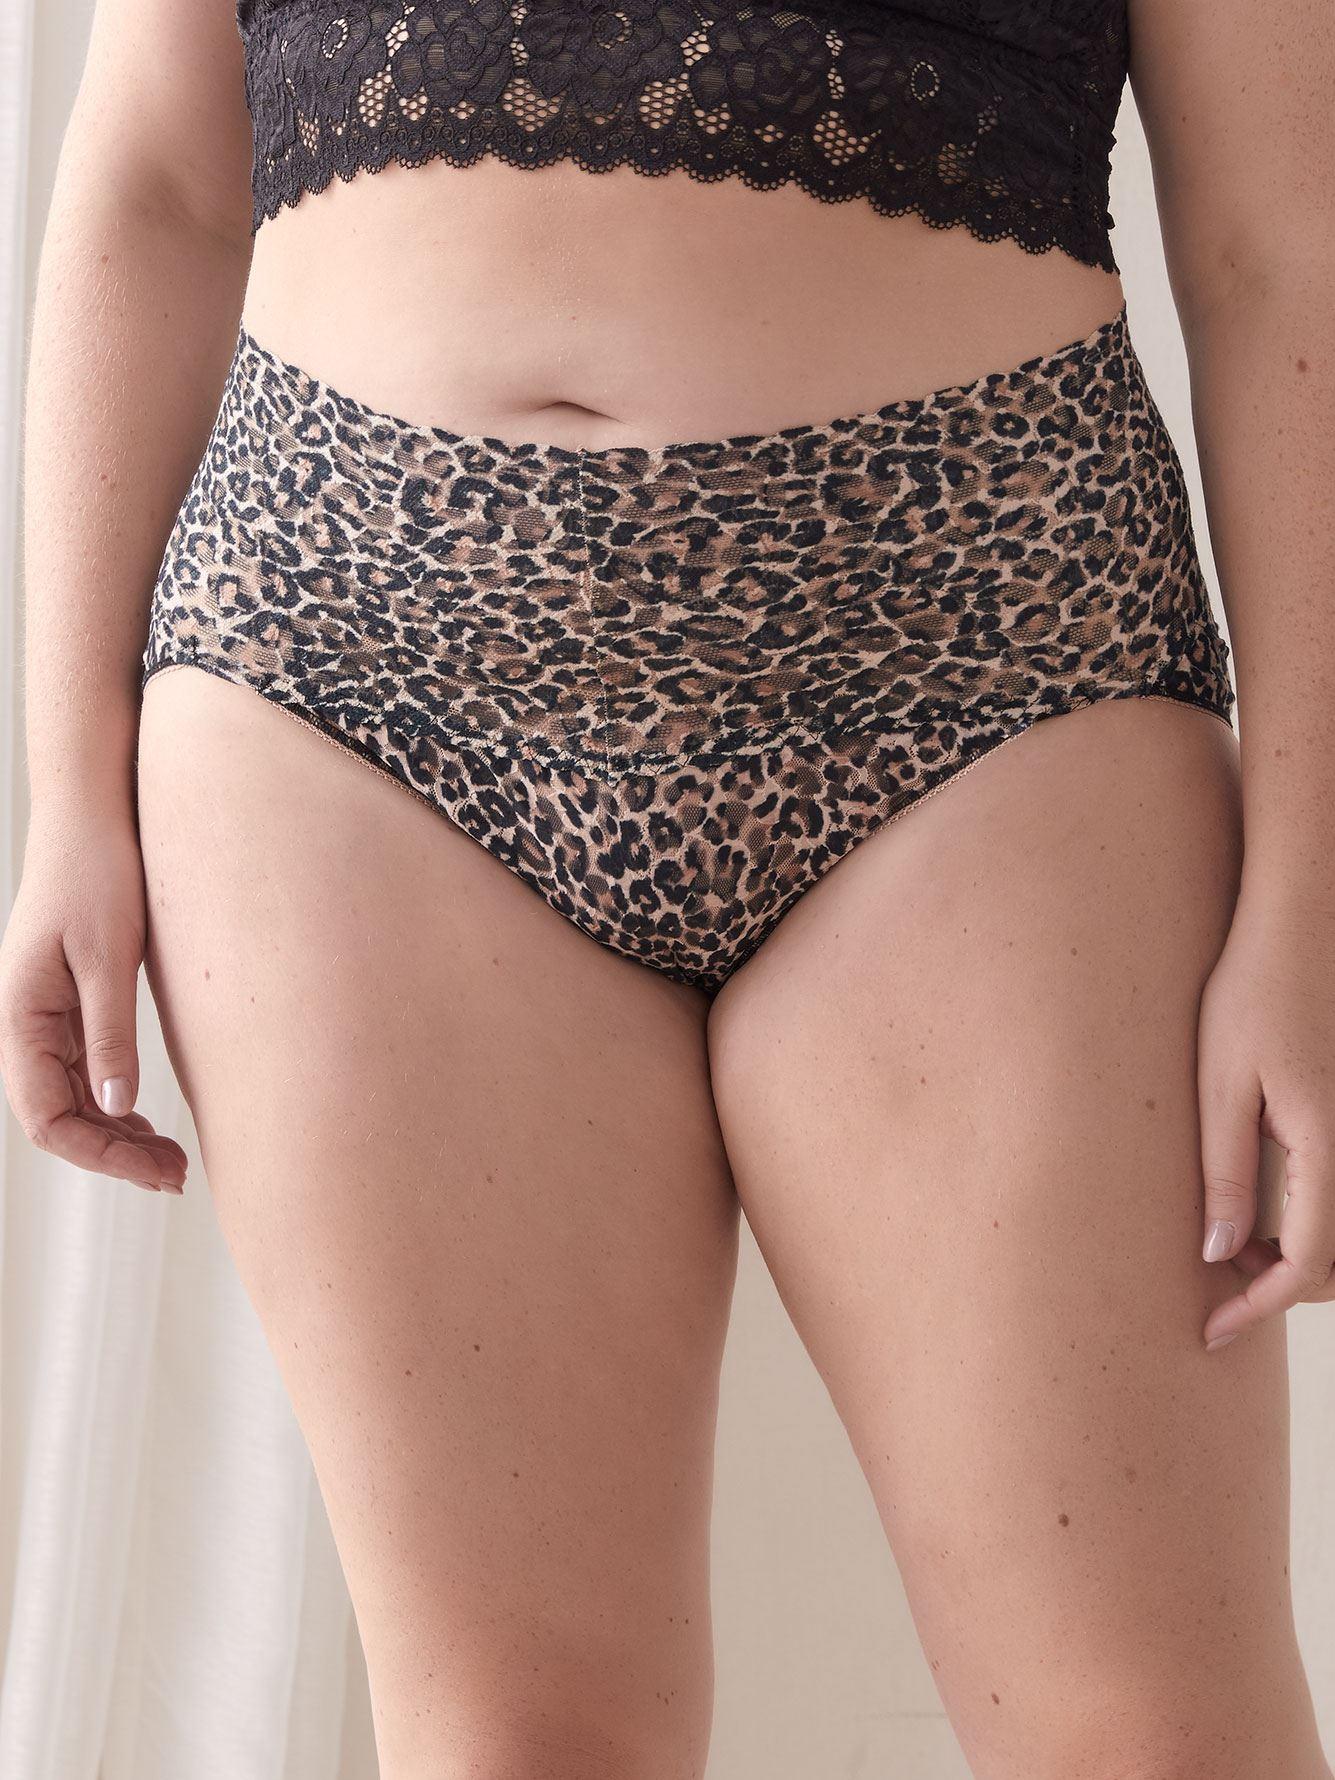 Retro Lace Bikini-Style Panty - Hanky Panky